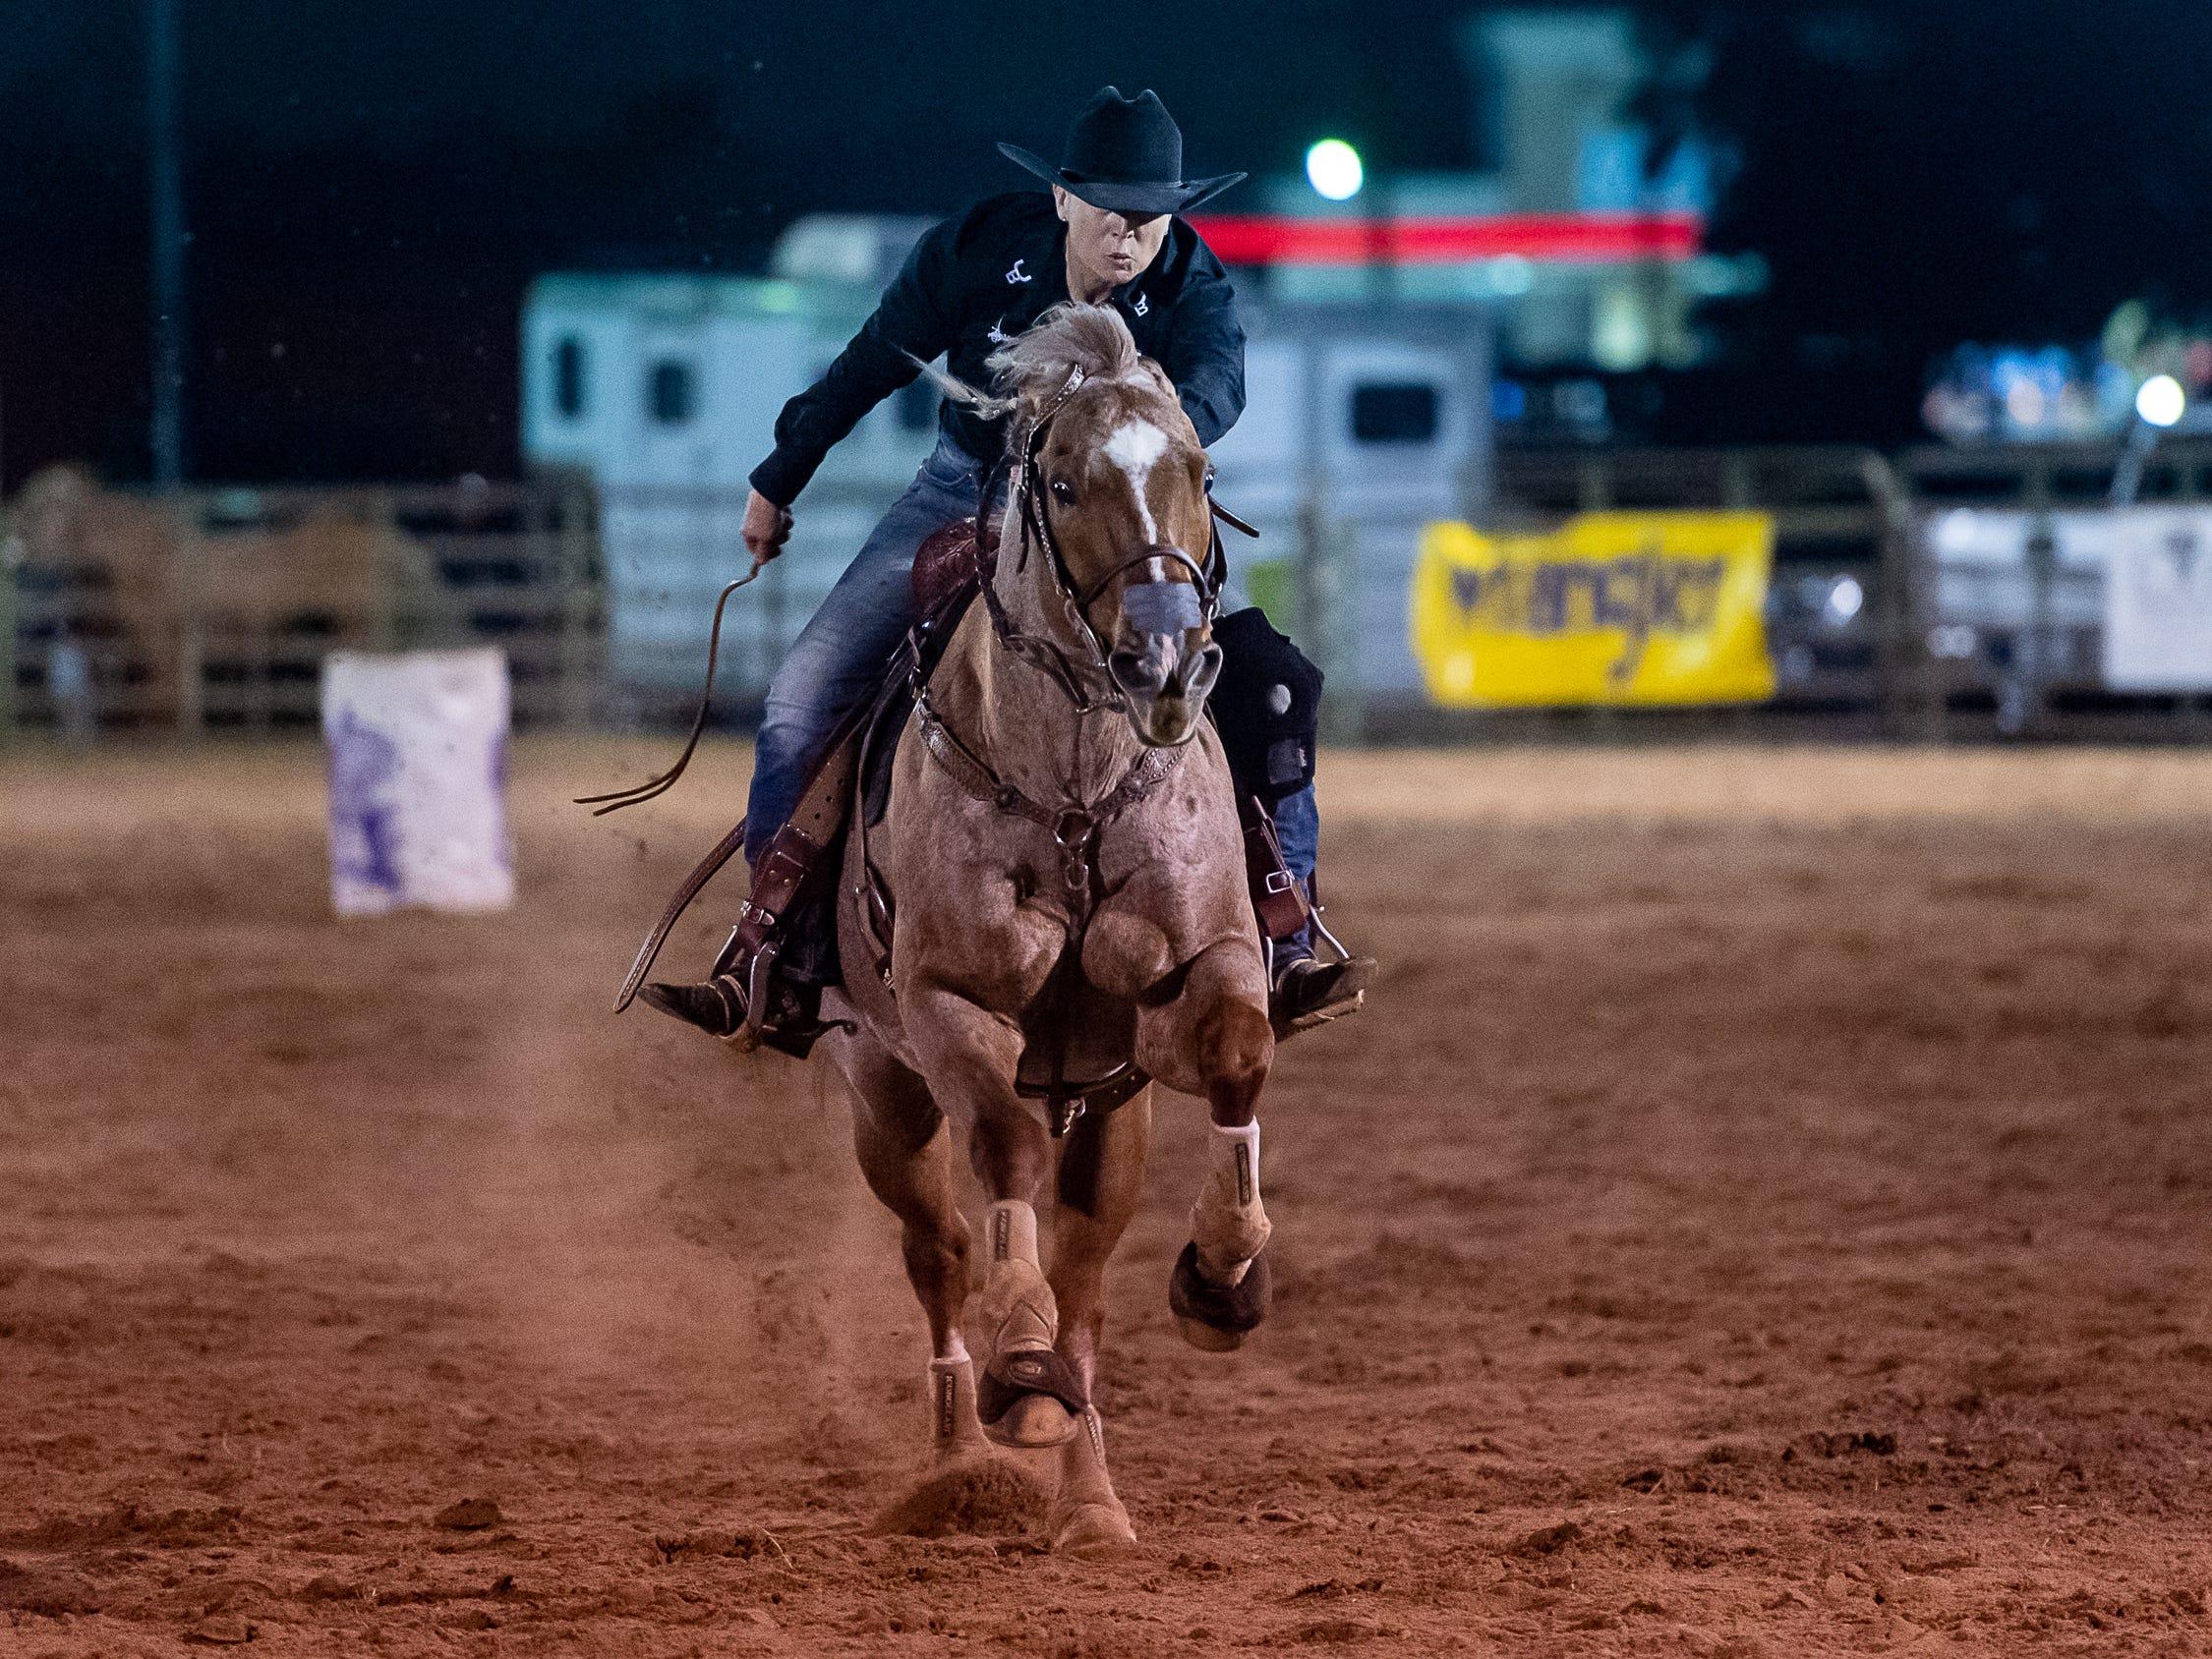 Cajun Rodeo Association host the Cowboys Spring Stampede 19 Rodeo at Cowboys Arena in Scott, LA. Saturday, April 13, 2019.